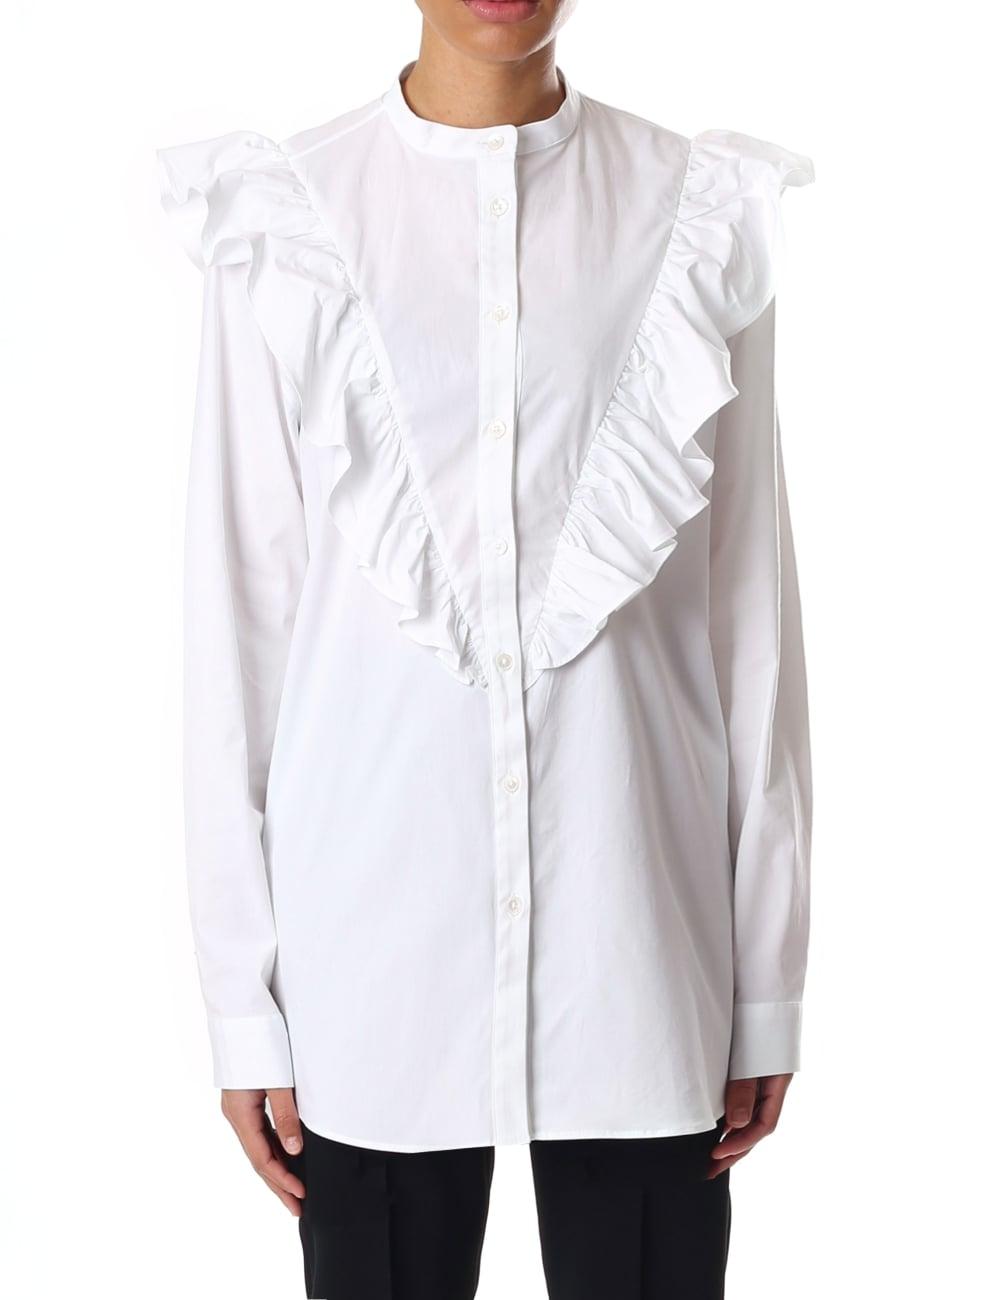 8590be248524a9 Paul Smith White Frill Detail Women's Cotton Shirt